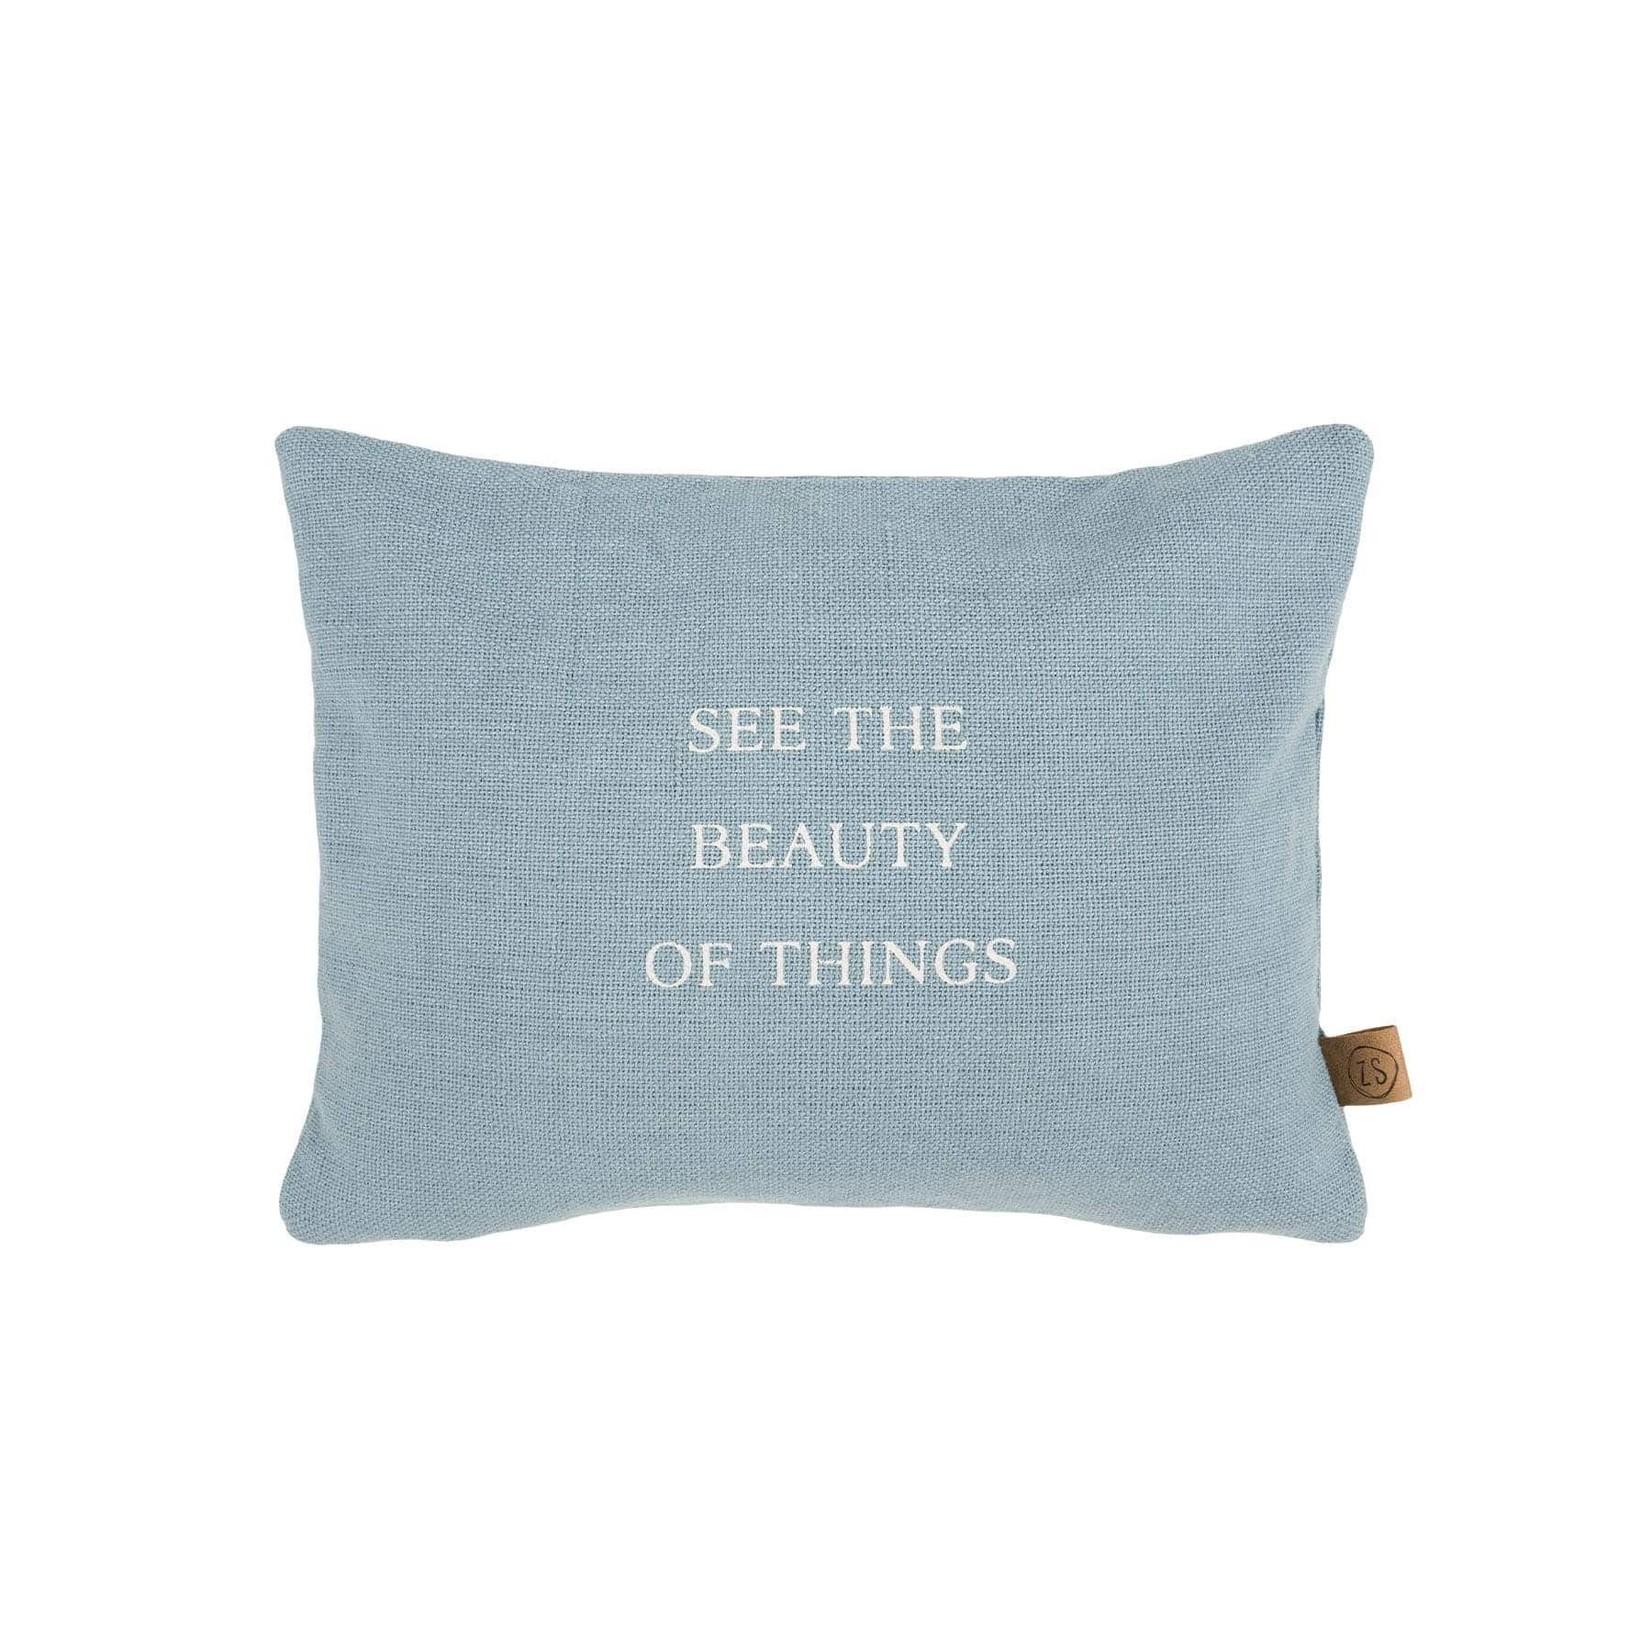 Kussen beauty of things 35x25cm grijs-blauw Zusss